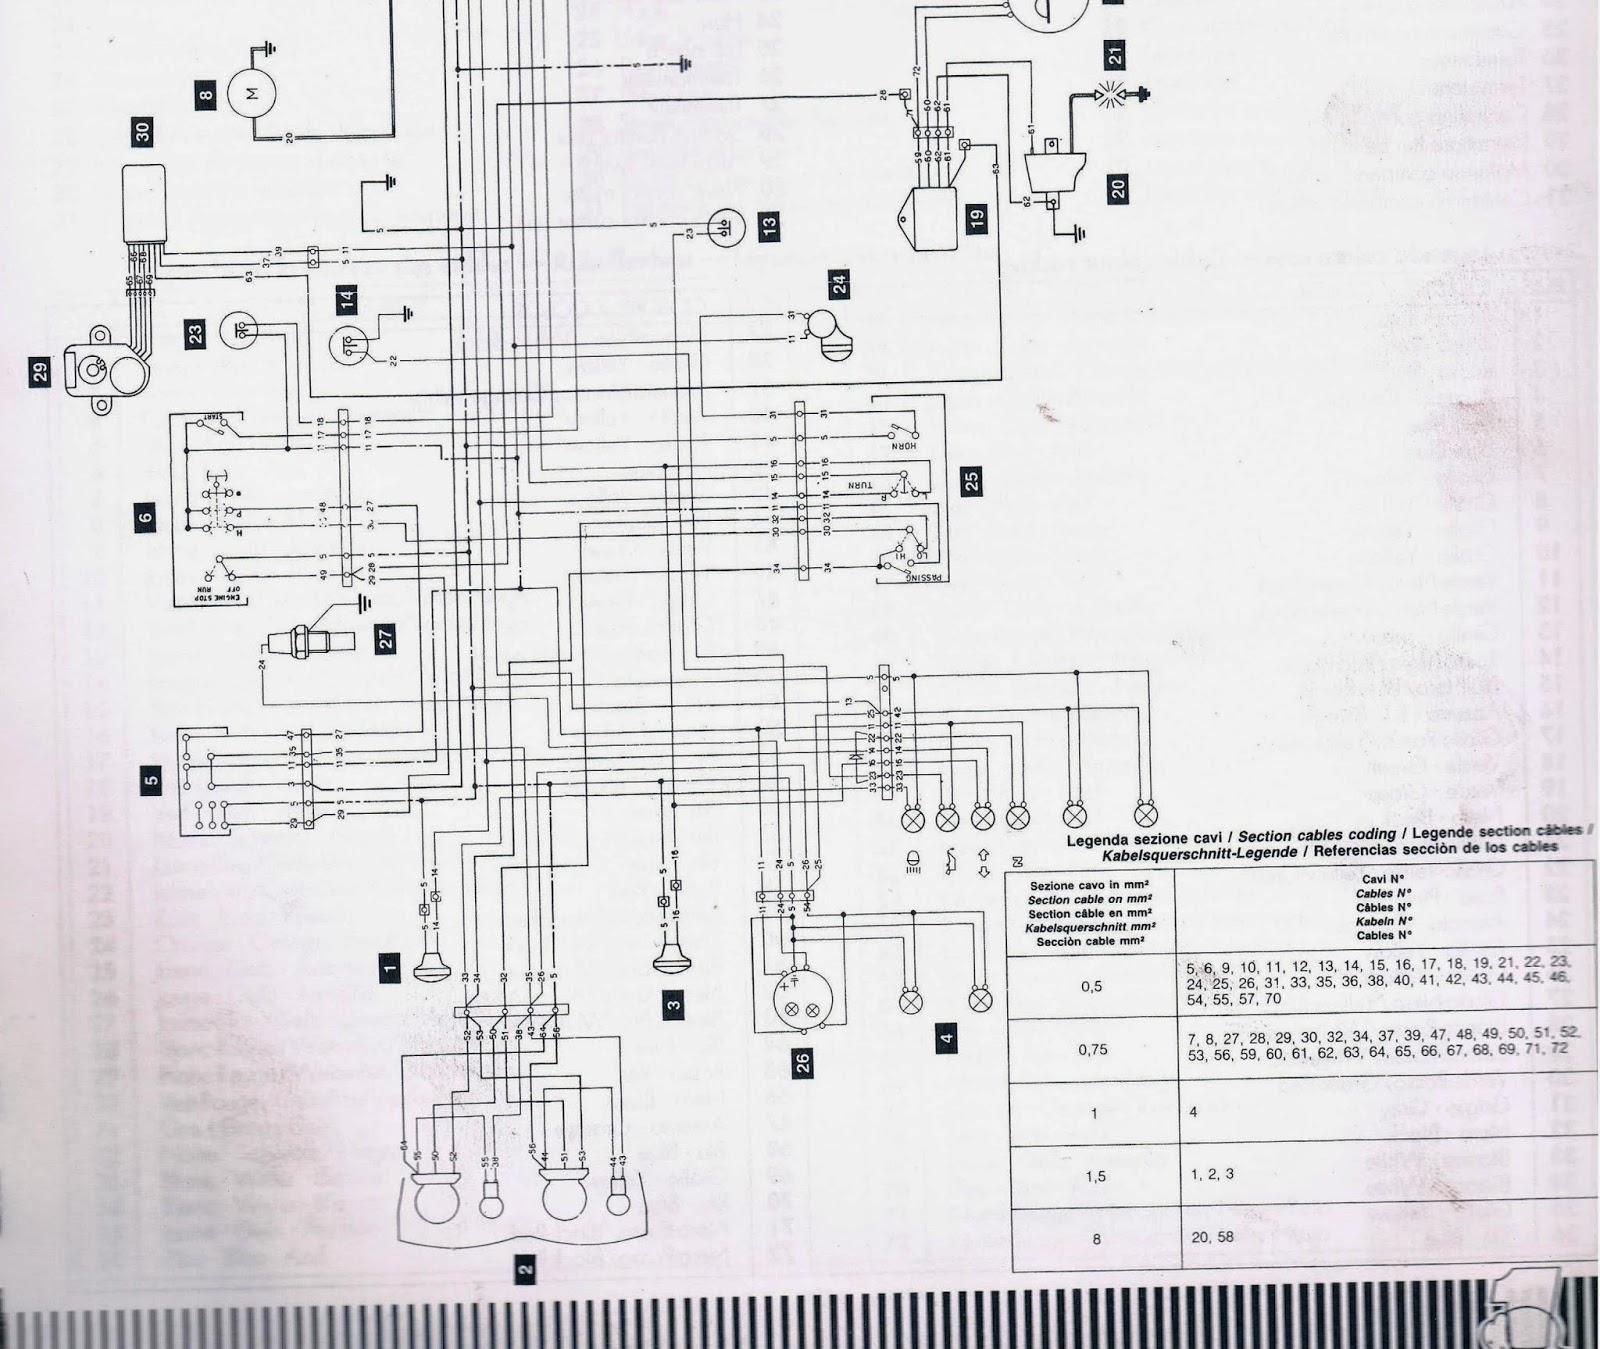 lifan wiring diagram 125 single phase voltage regulator honda cl70